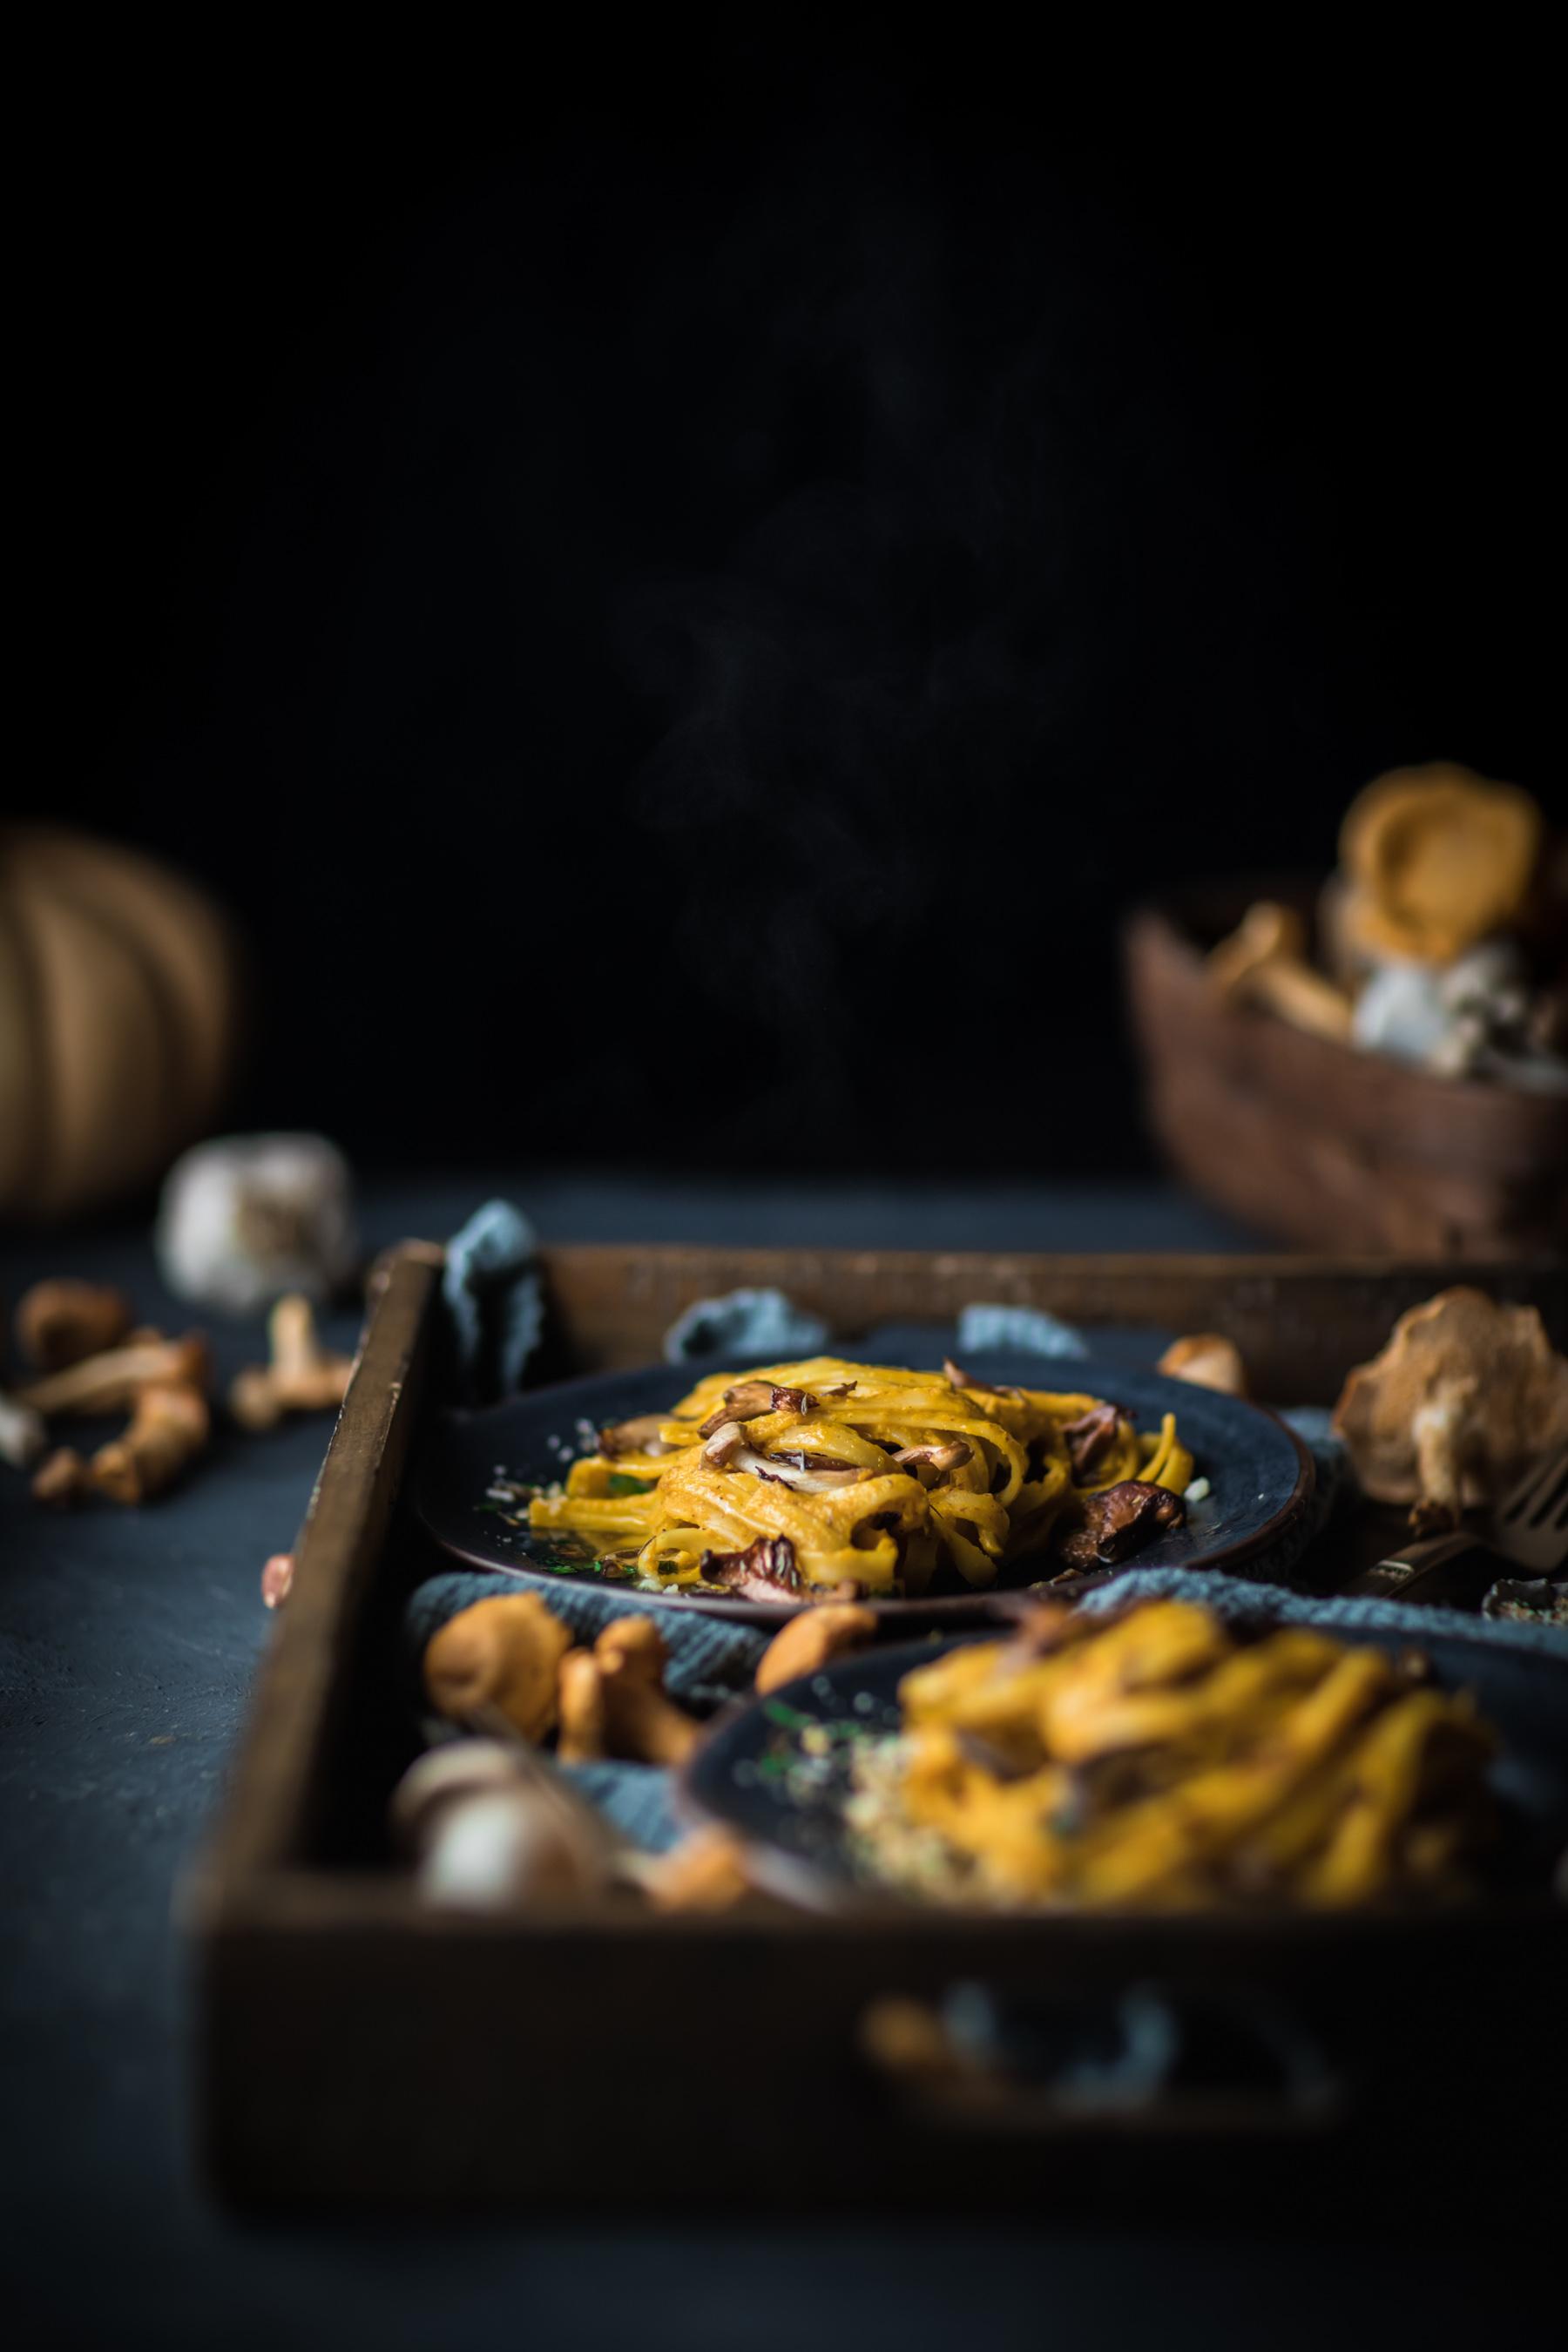 Creamy Squash and Hazelnut Fettuccine with Sautéed Mushrooms